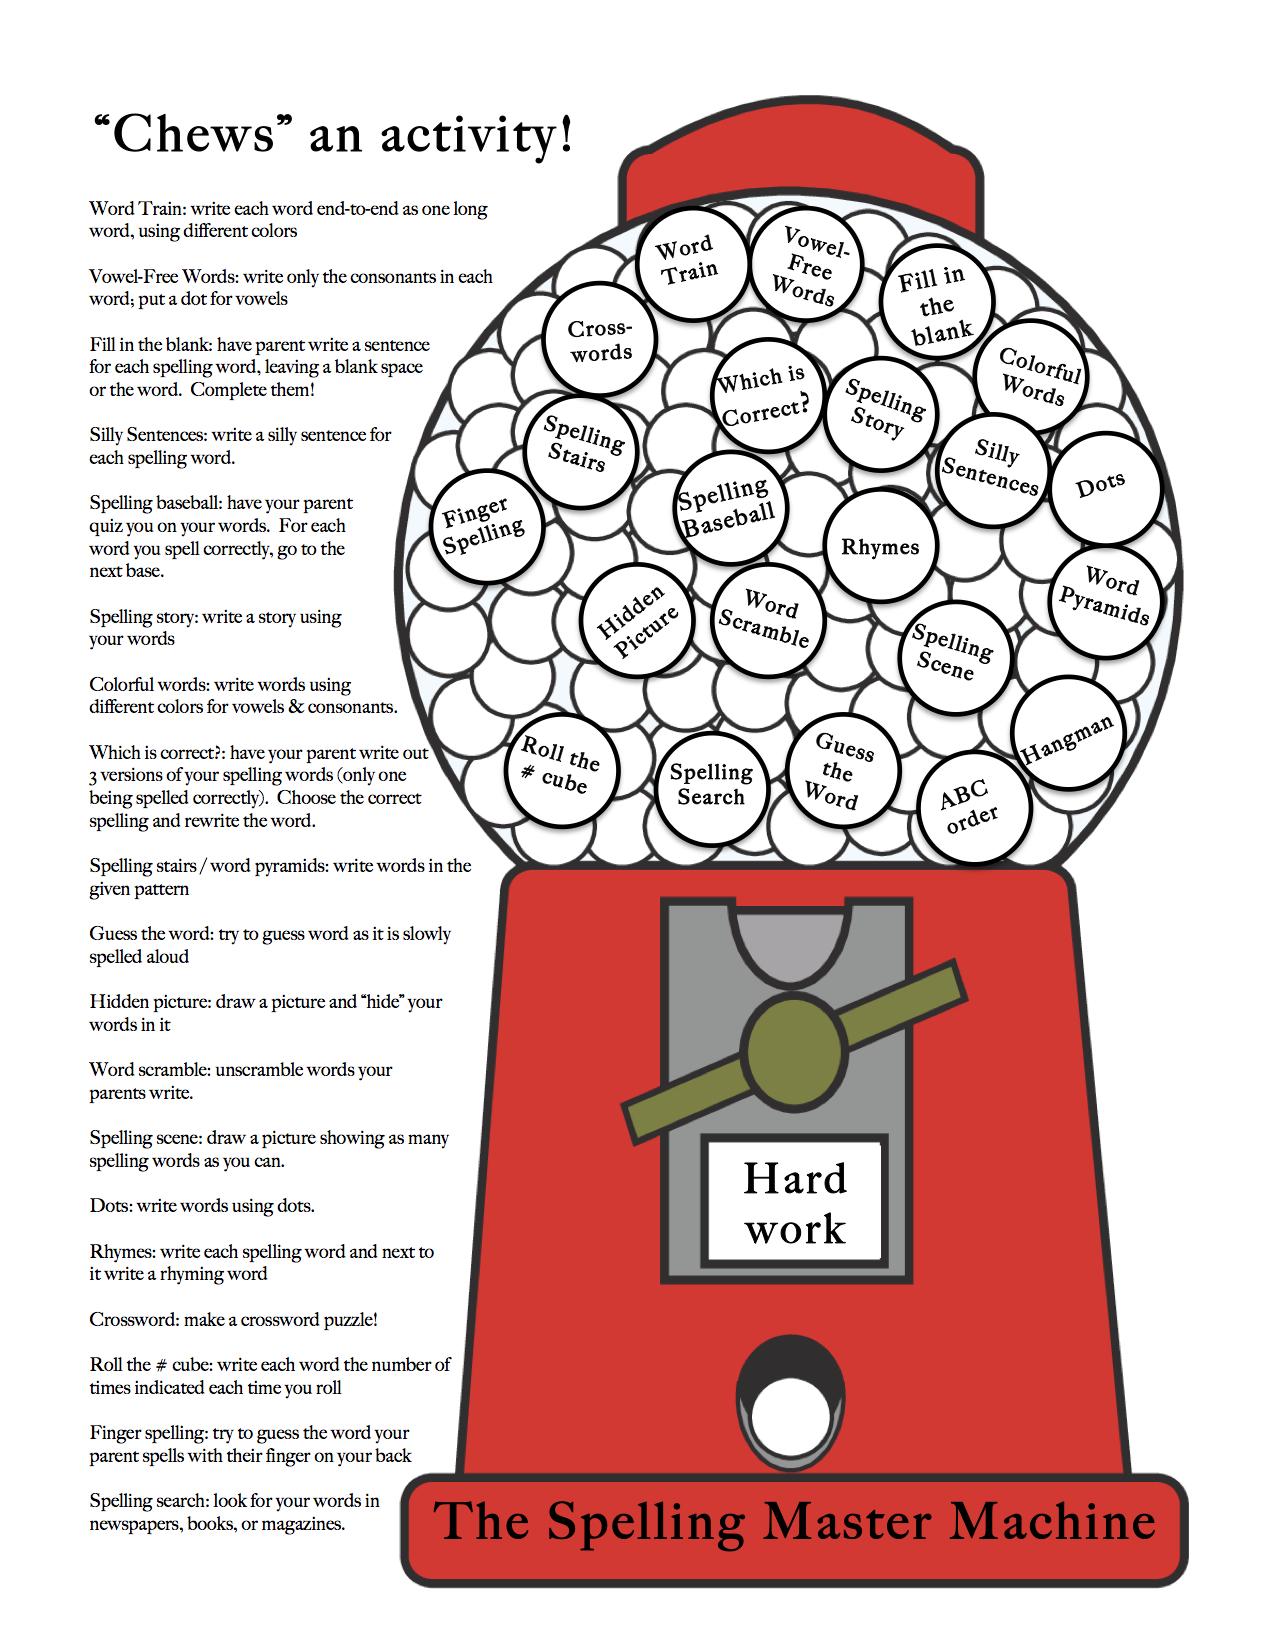 Spelling Practice Guide For Elementary School